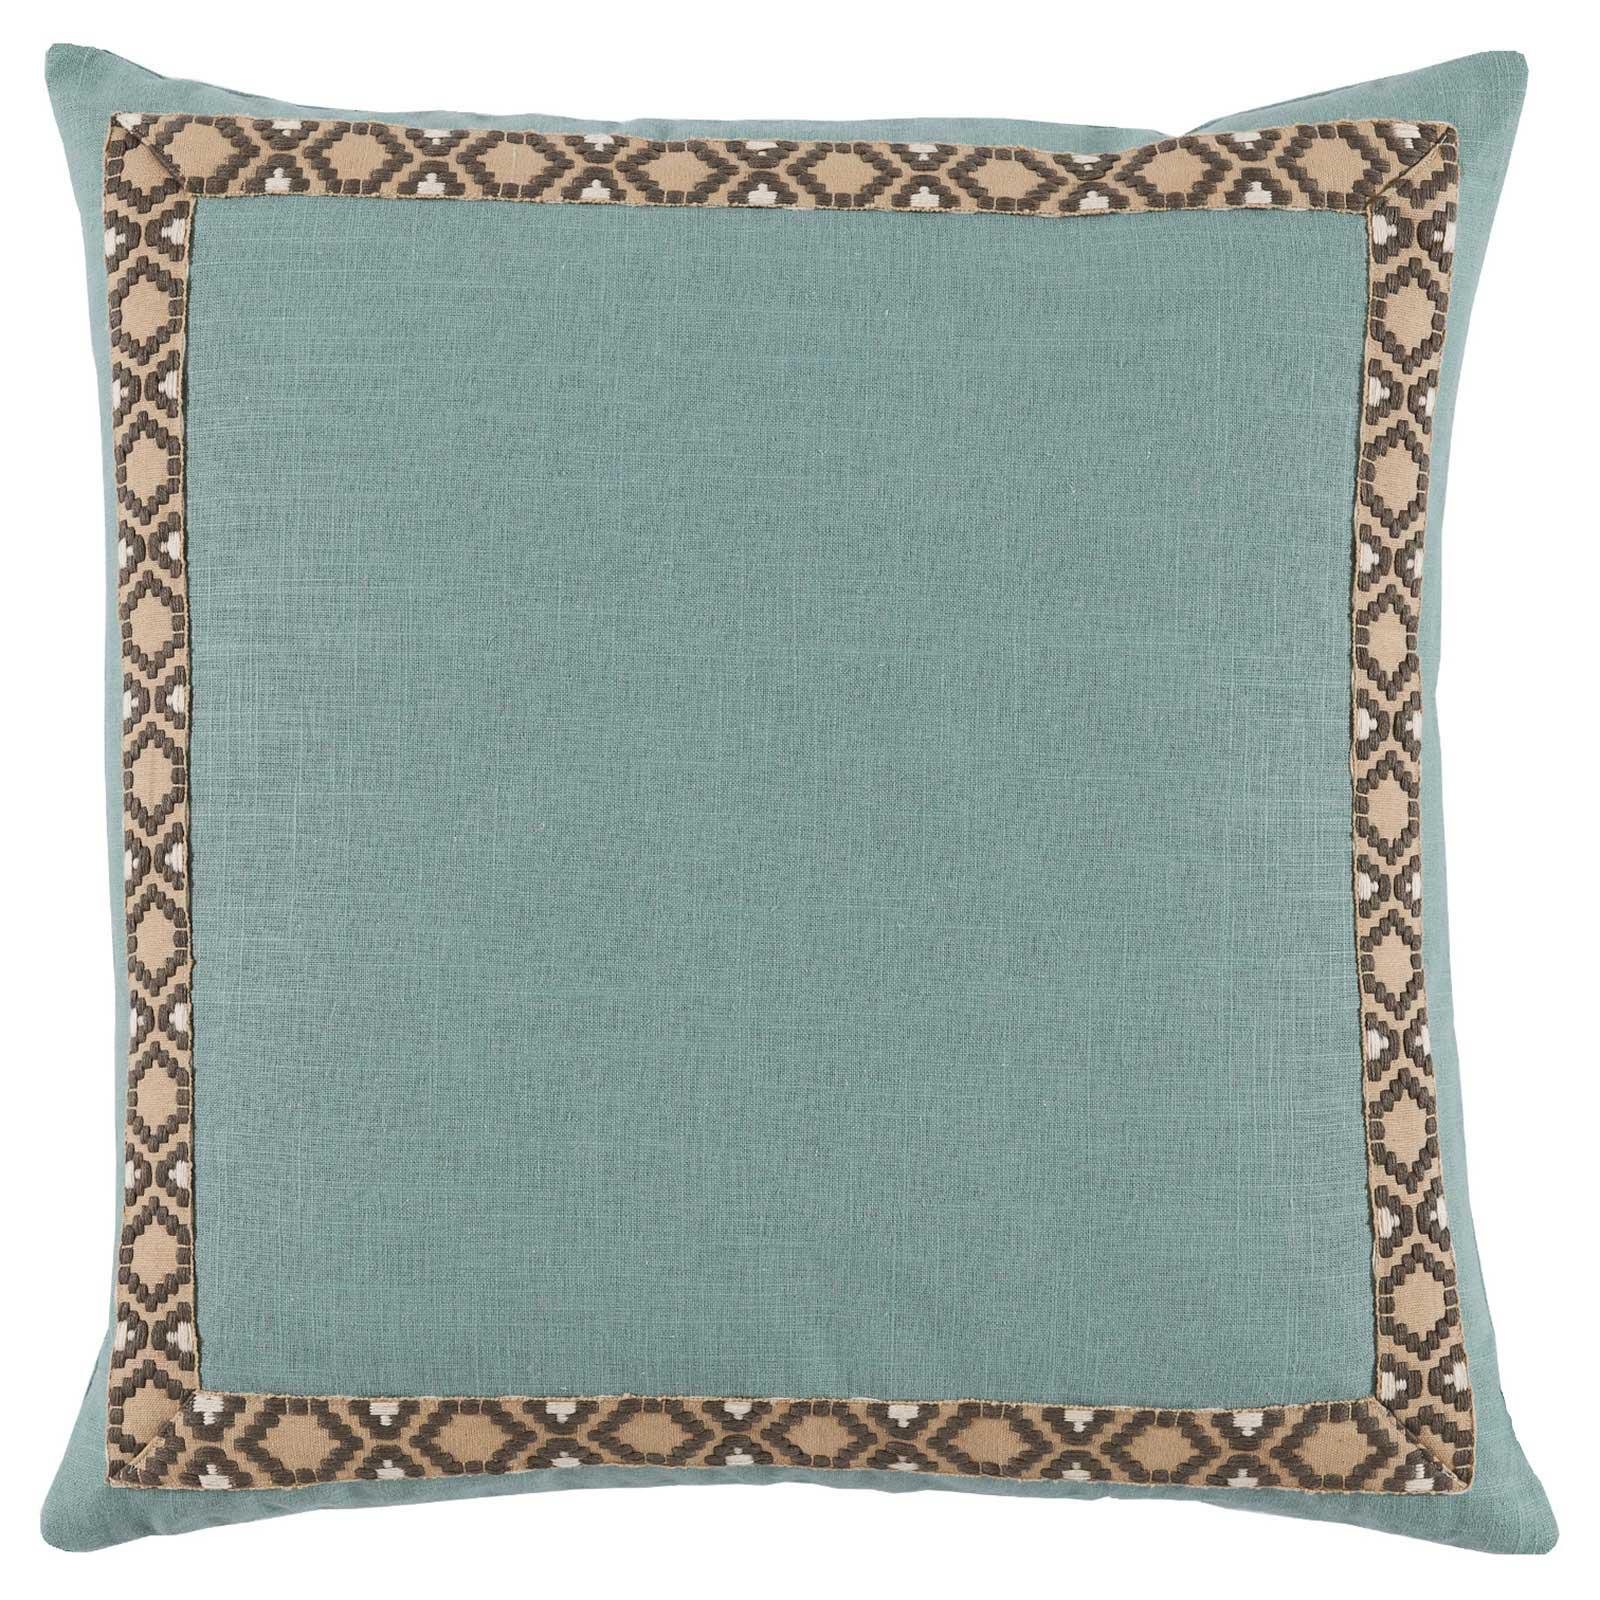 Kaia Global Marine Blue Linen Trim Band Pillow - 24x24